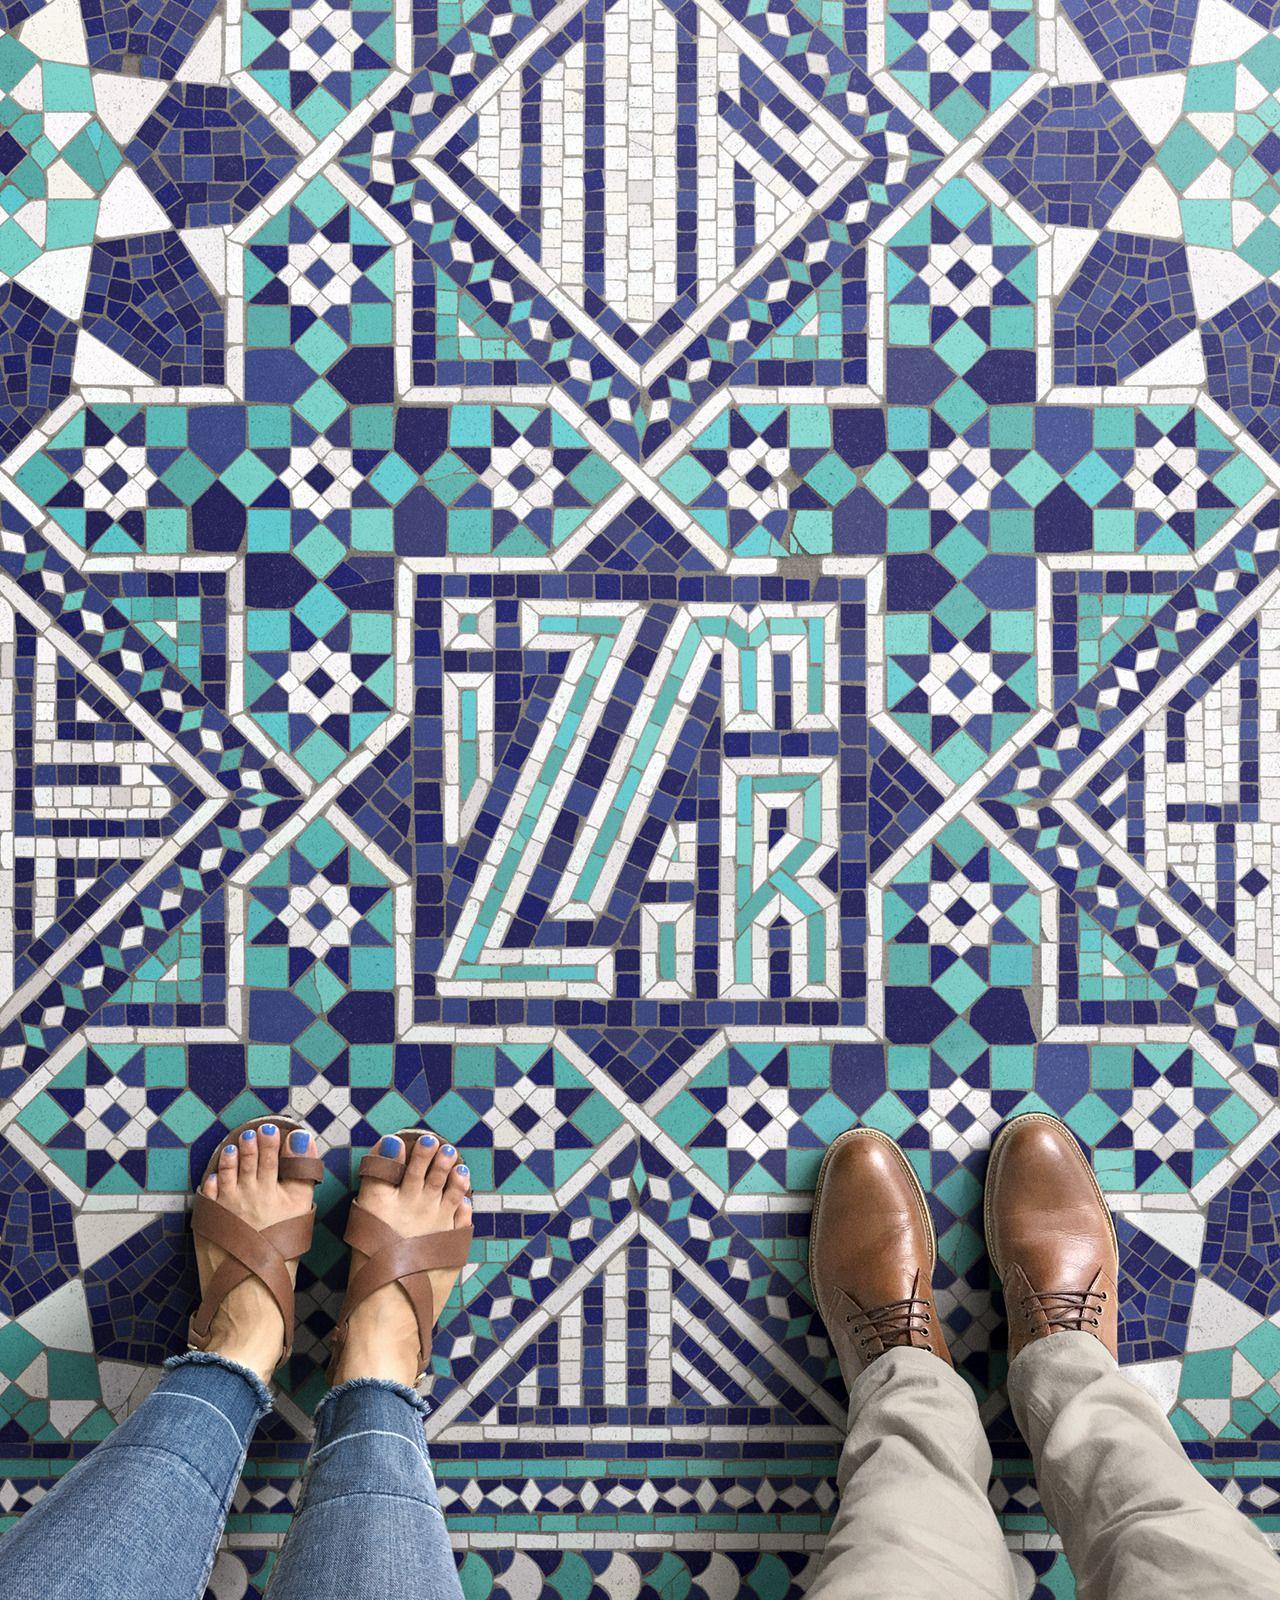 Nick Misani's mosaic work is simply stunning.